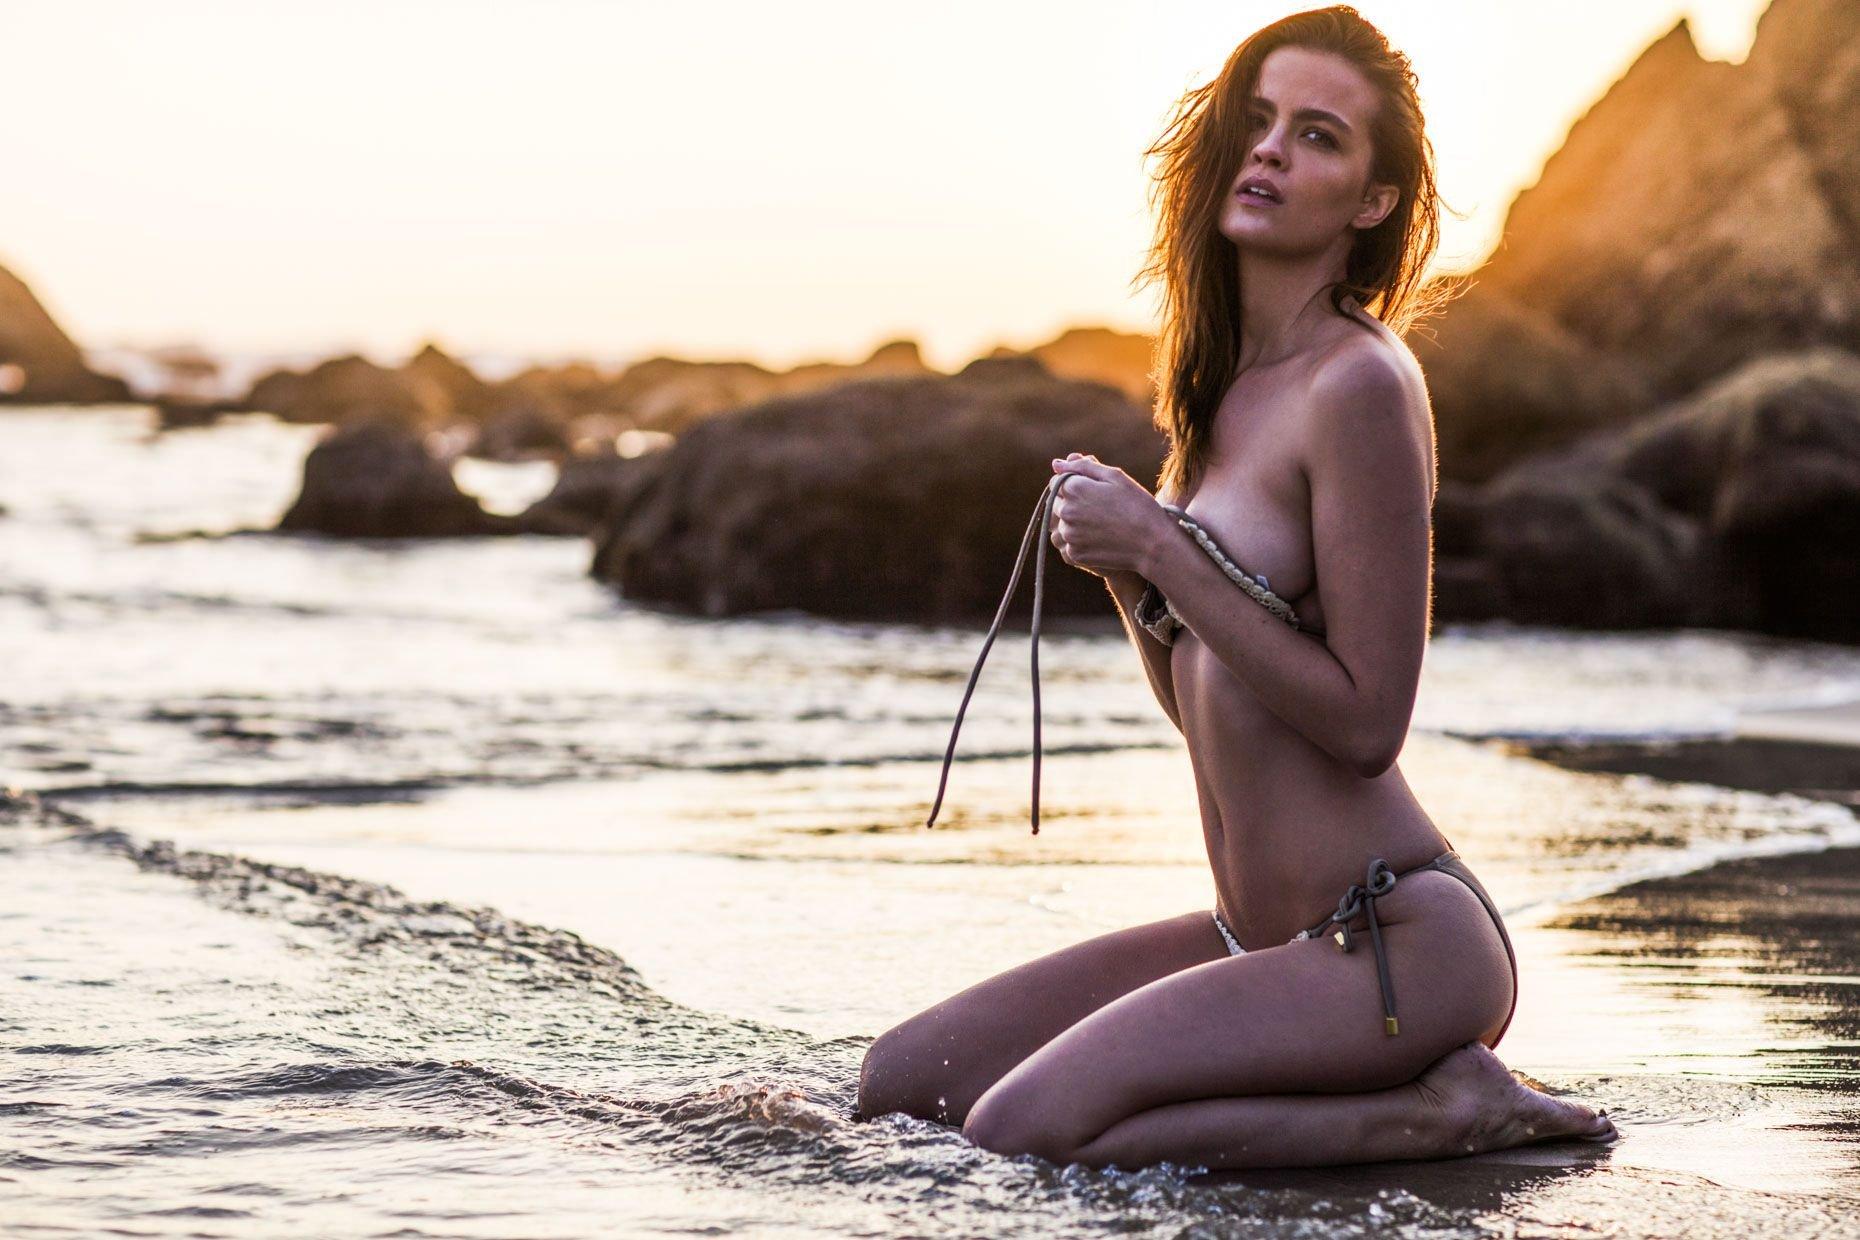 Sex Katelyn Pascavis naked (53 foto and video), Ass, Bikini, Boobs, bra 2006